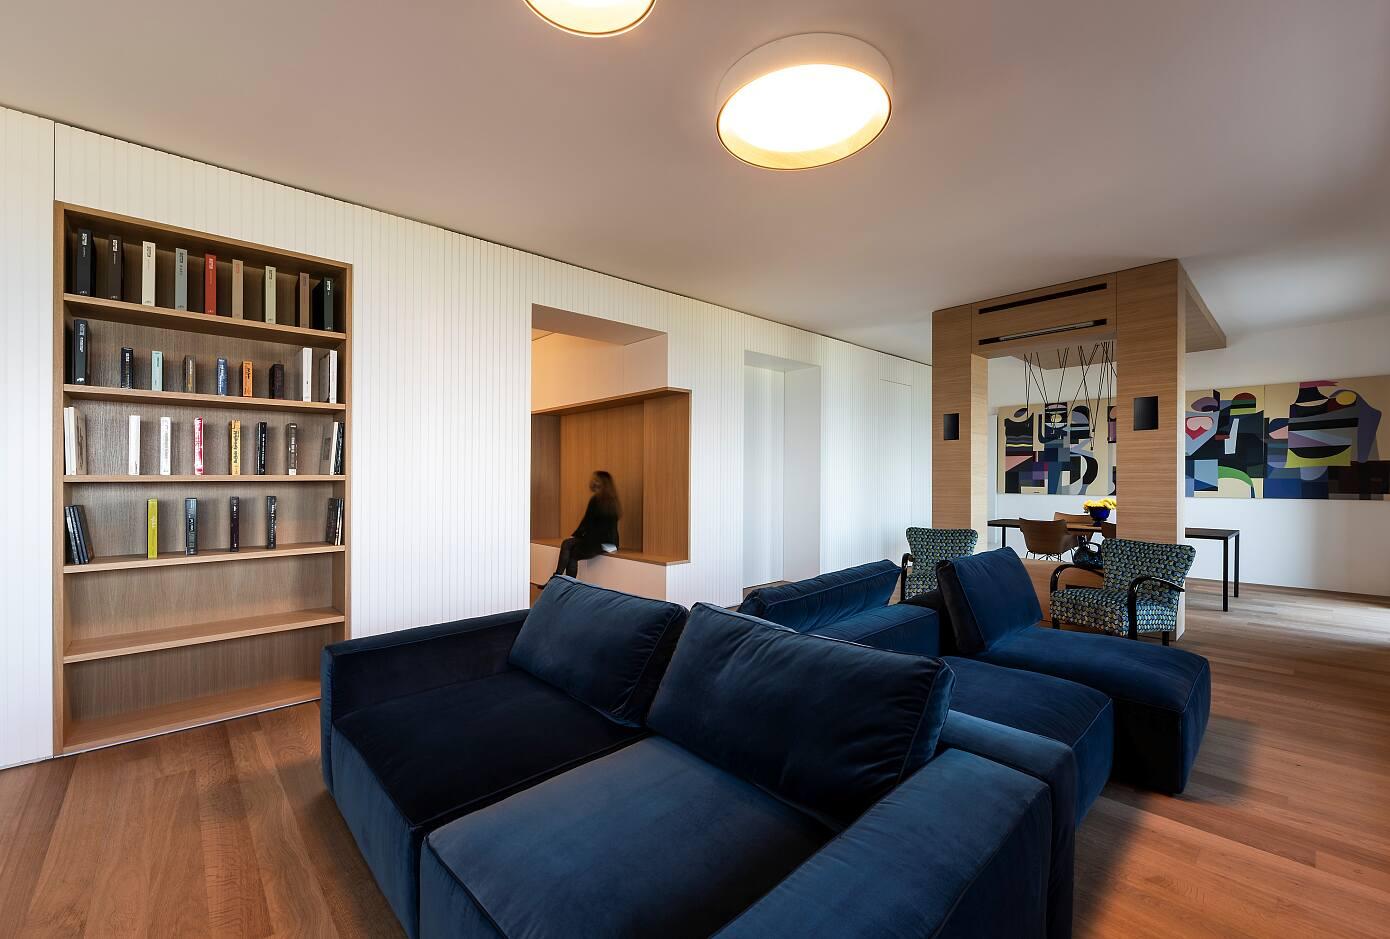 Casa Con Vista by Gemma Radicchio